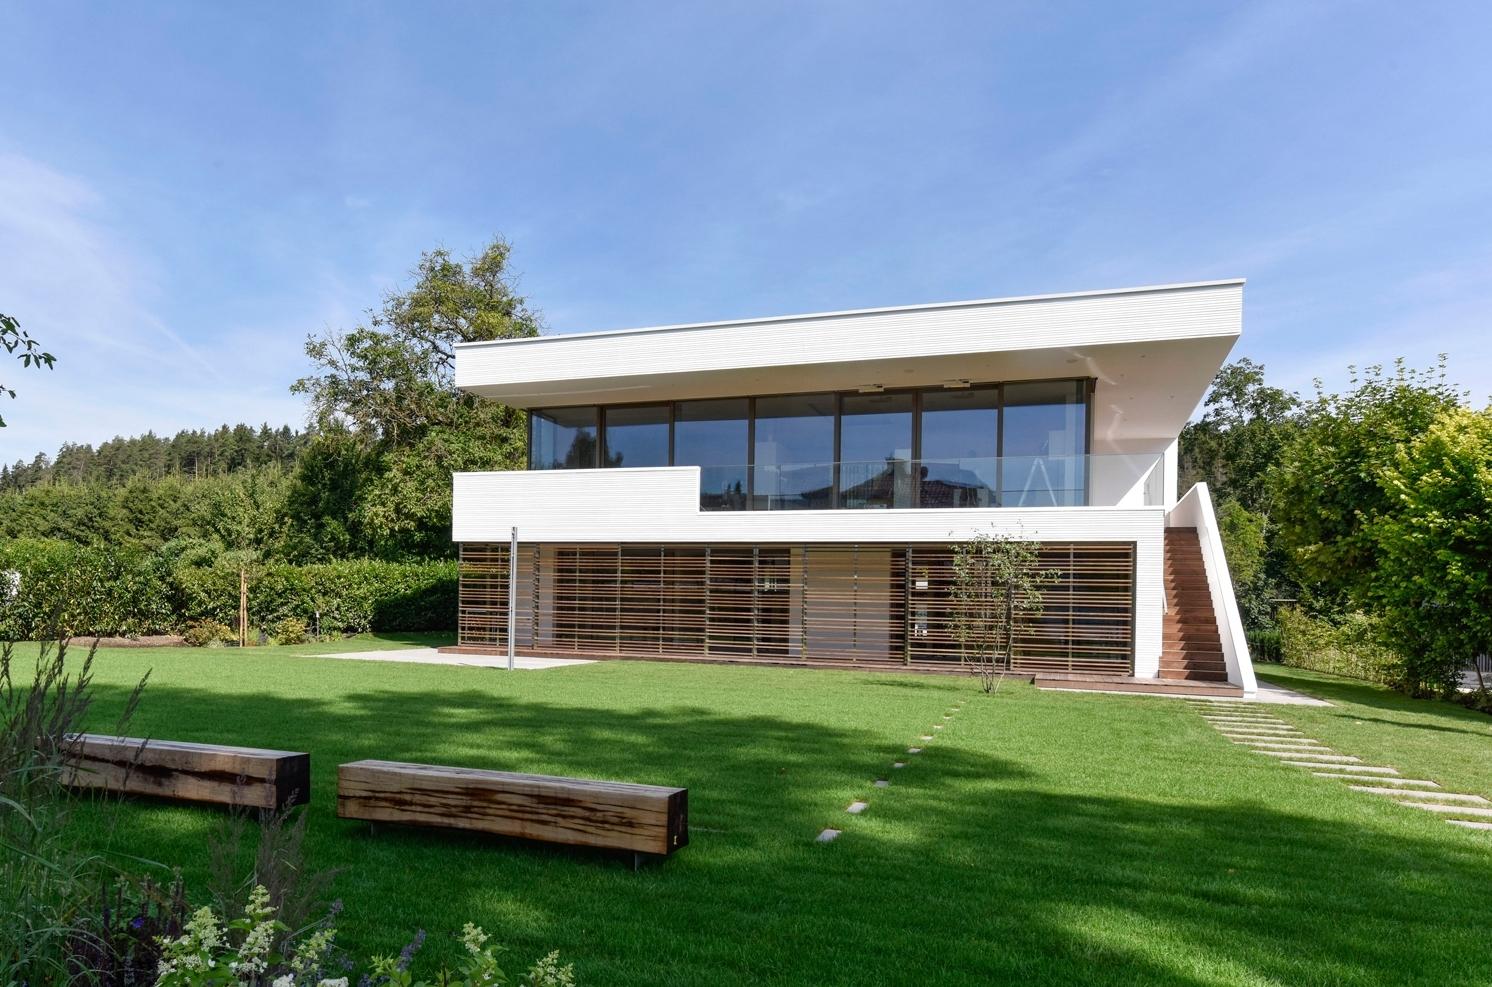 A01 architects - Residence Krumpendorf_(c) Hannes Kohlmeier__web08